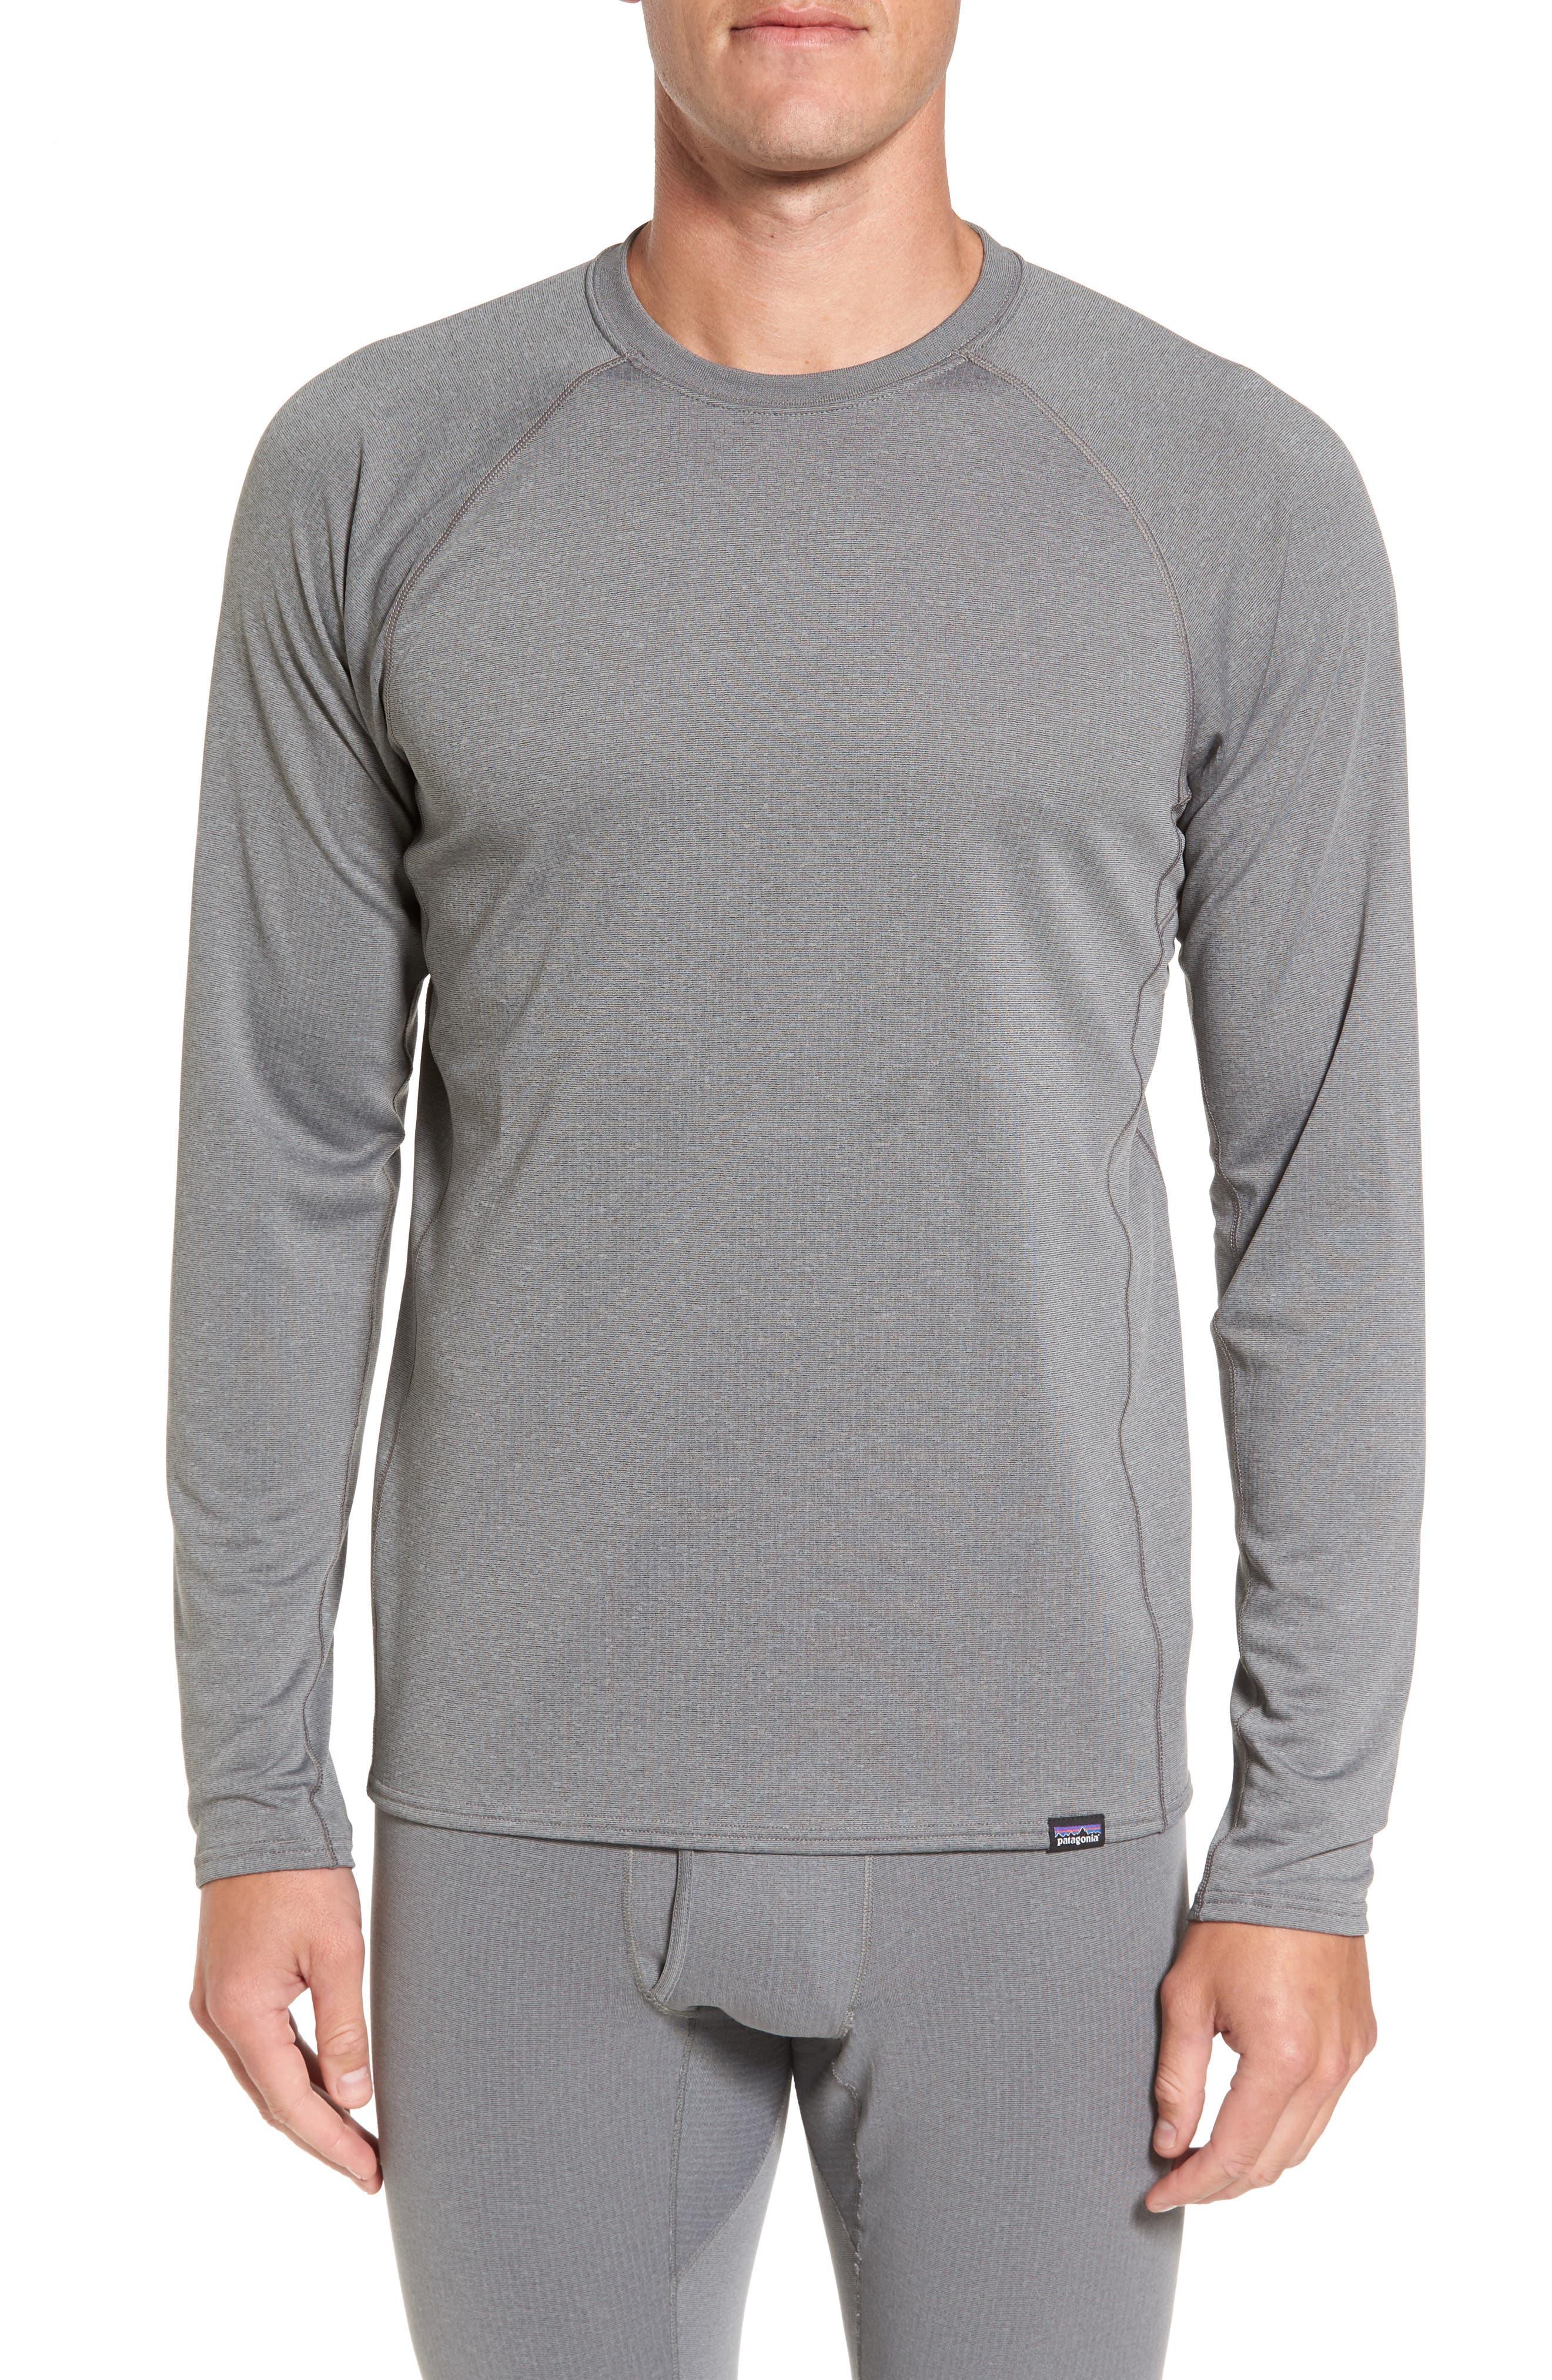 Patagonia Capilene Midweight Base Layer T-Shirt